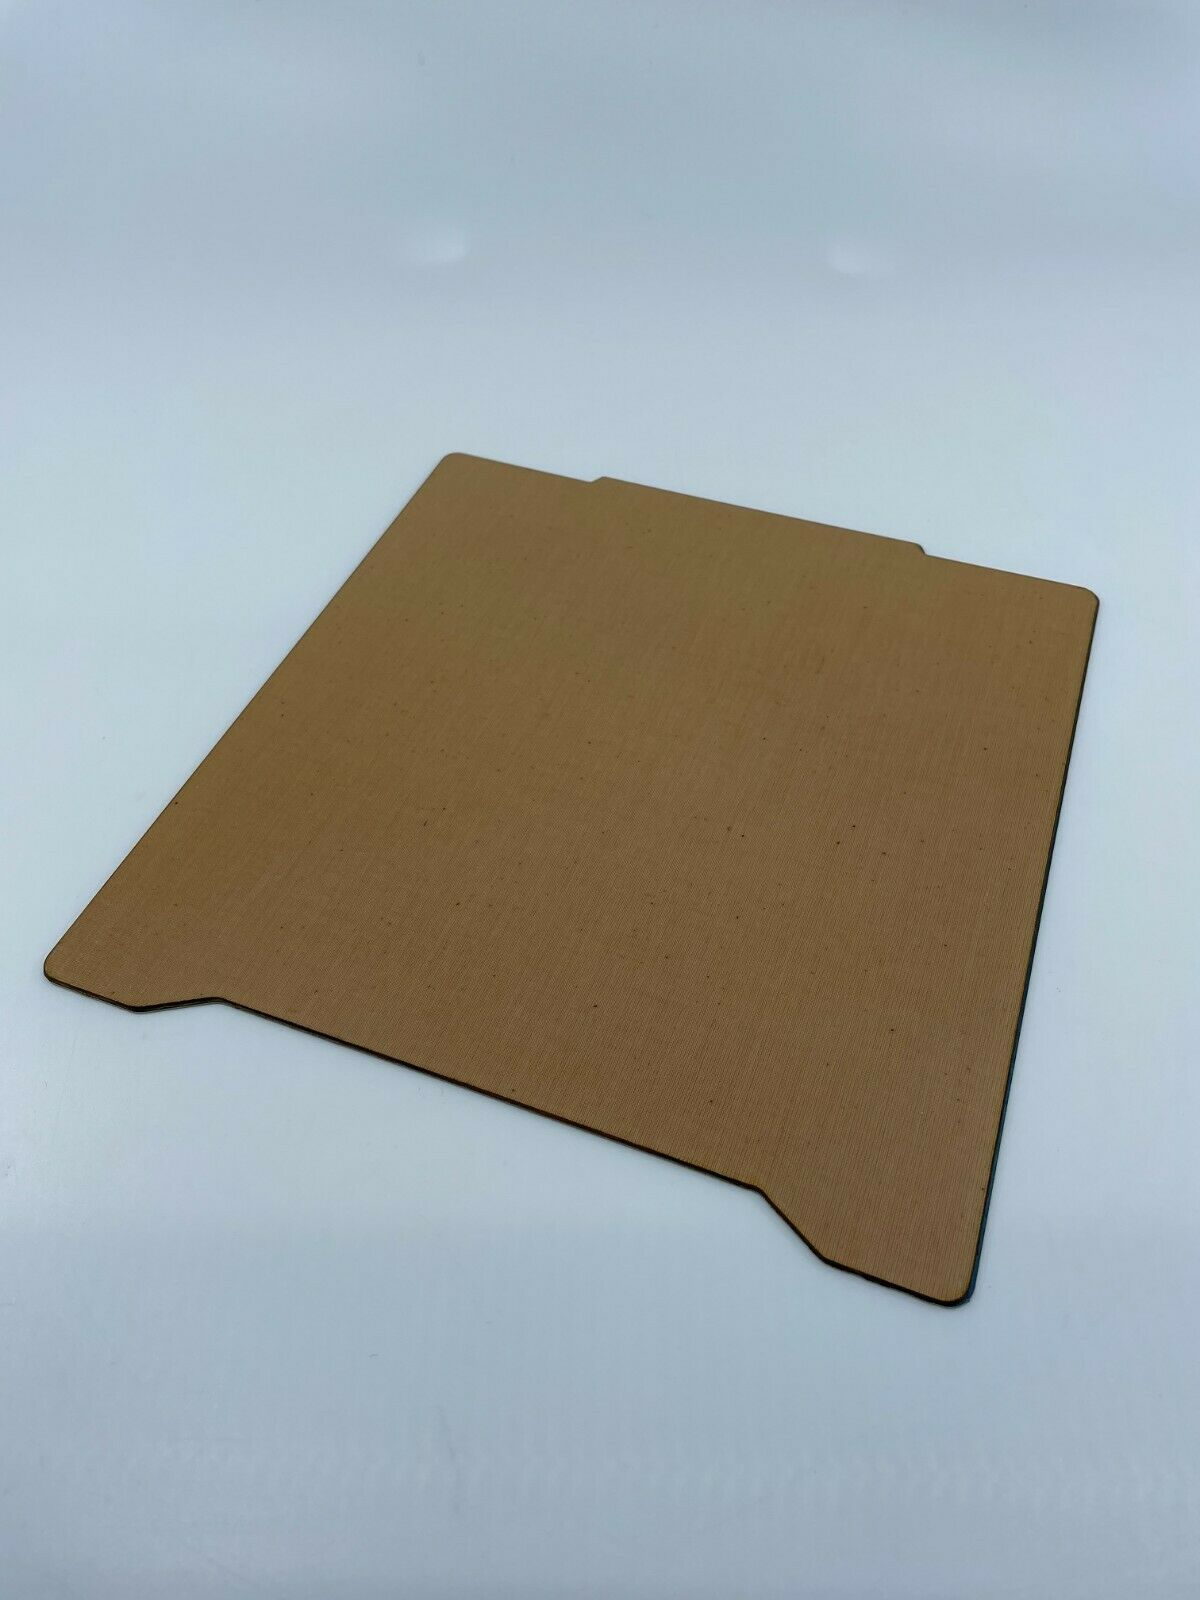 Prusa Mini Removable Build Plate w/ Garolite Print Surface for Nylon USA MADE